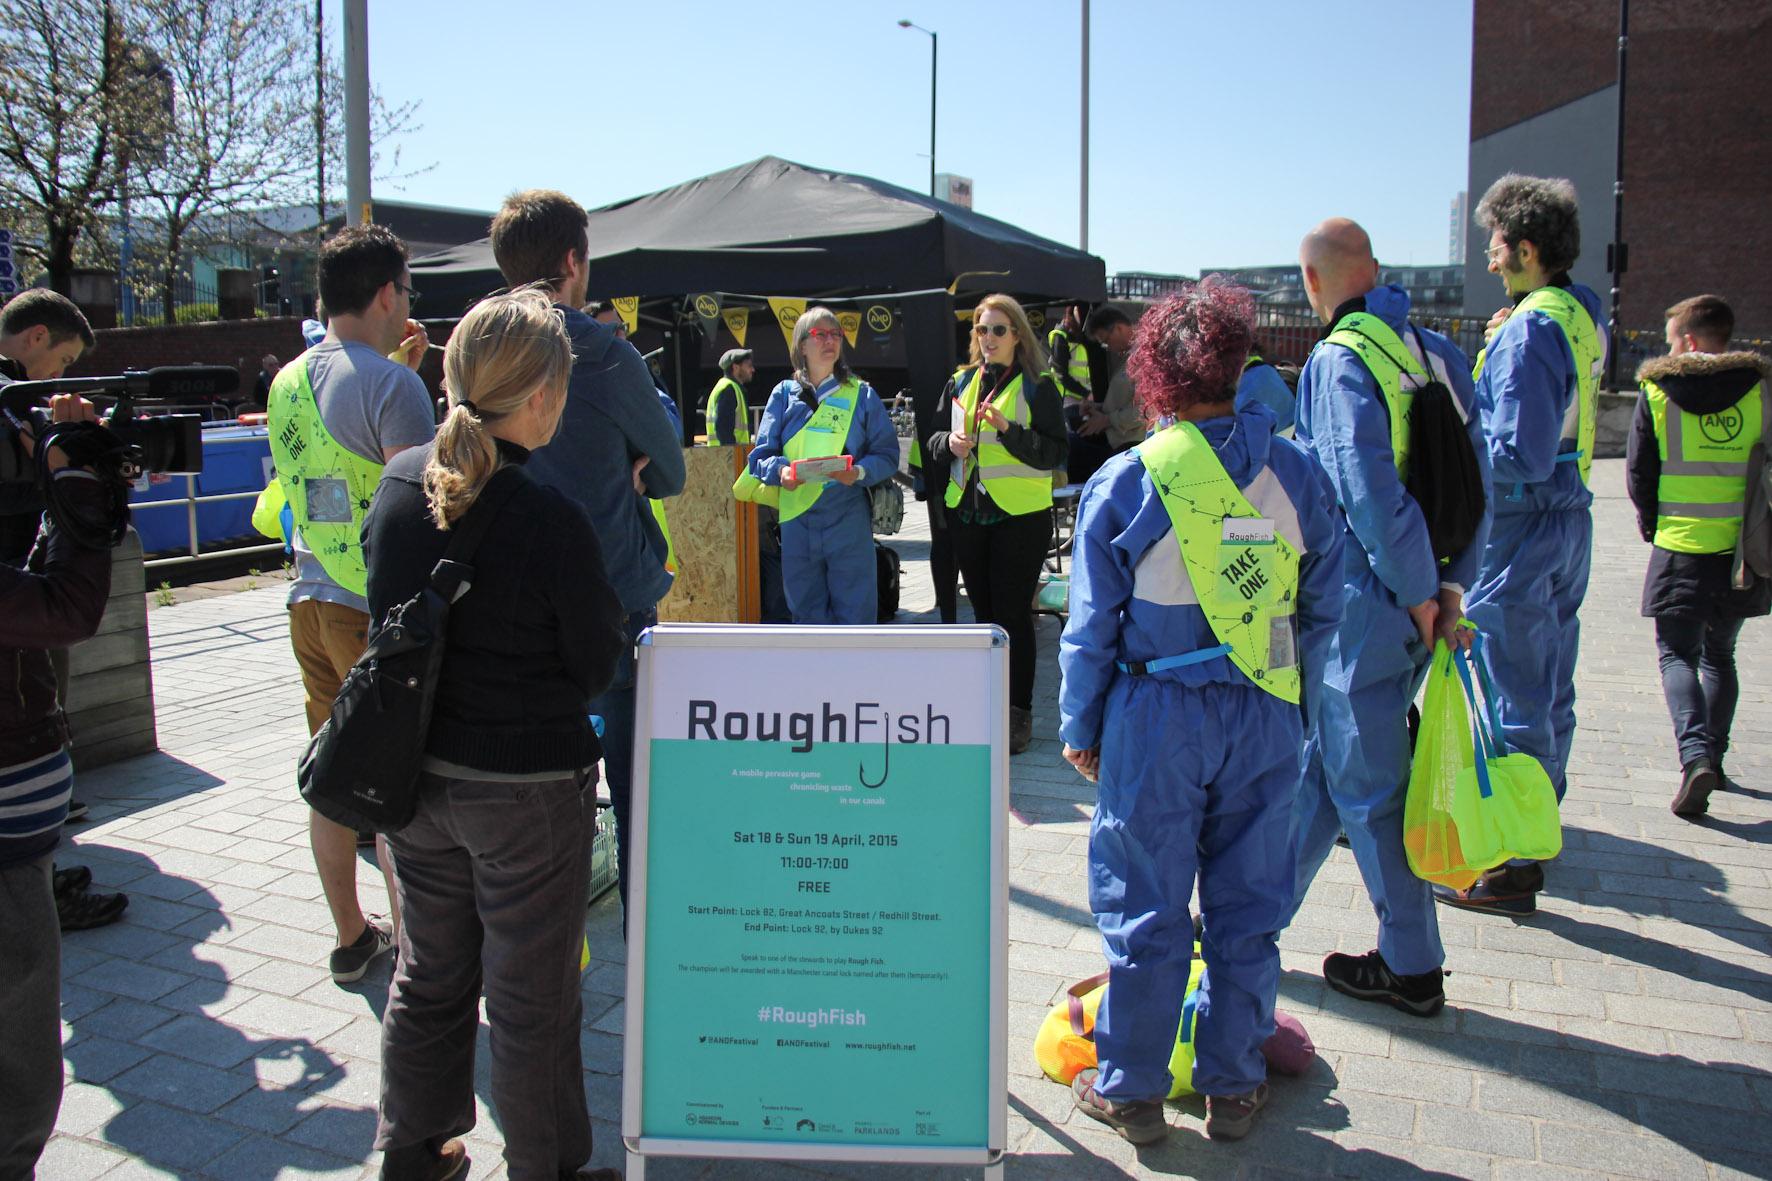 RoughFish-LucyBarker-3347